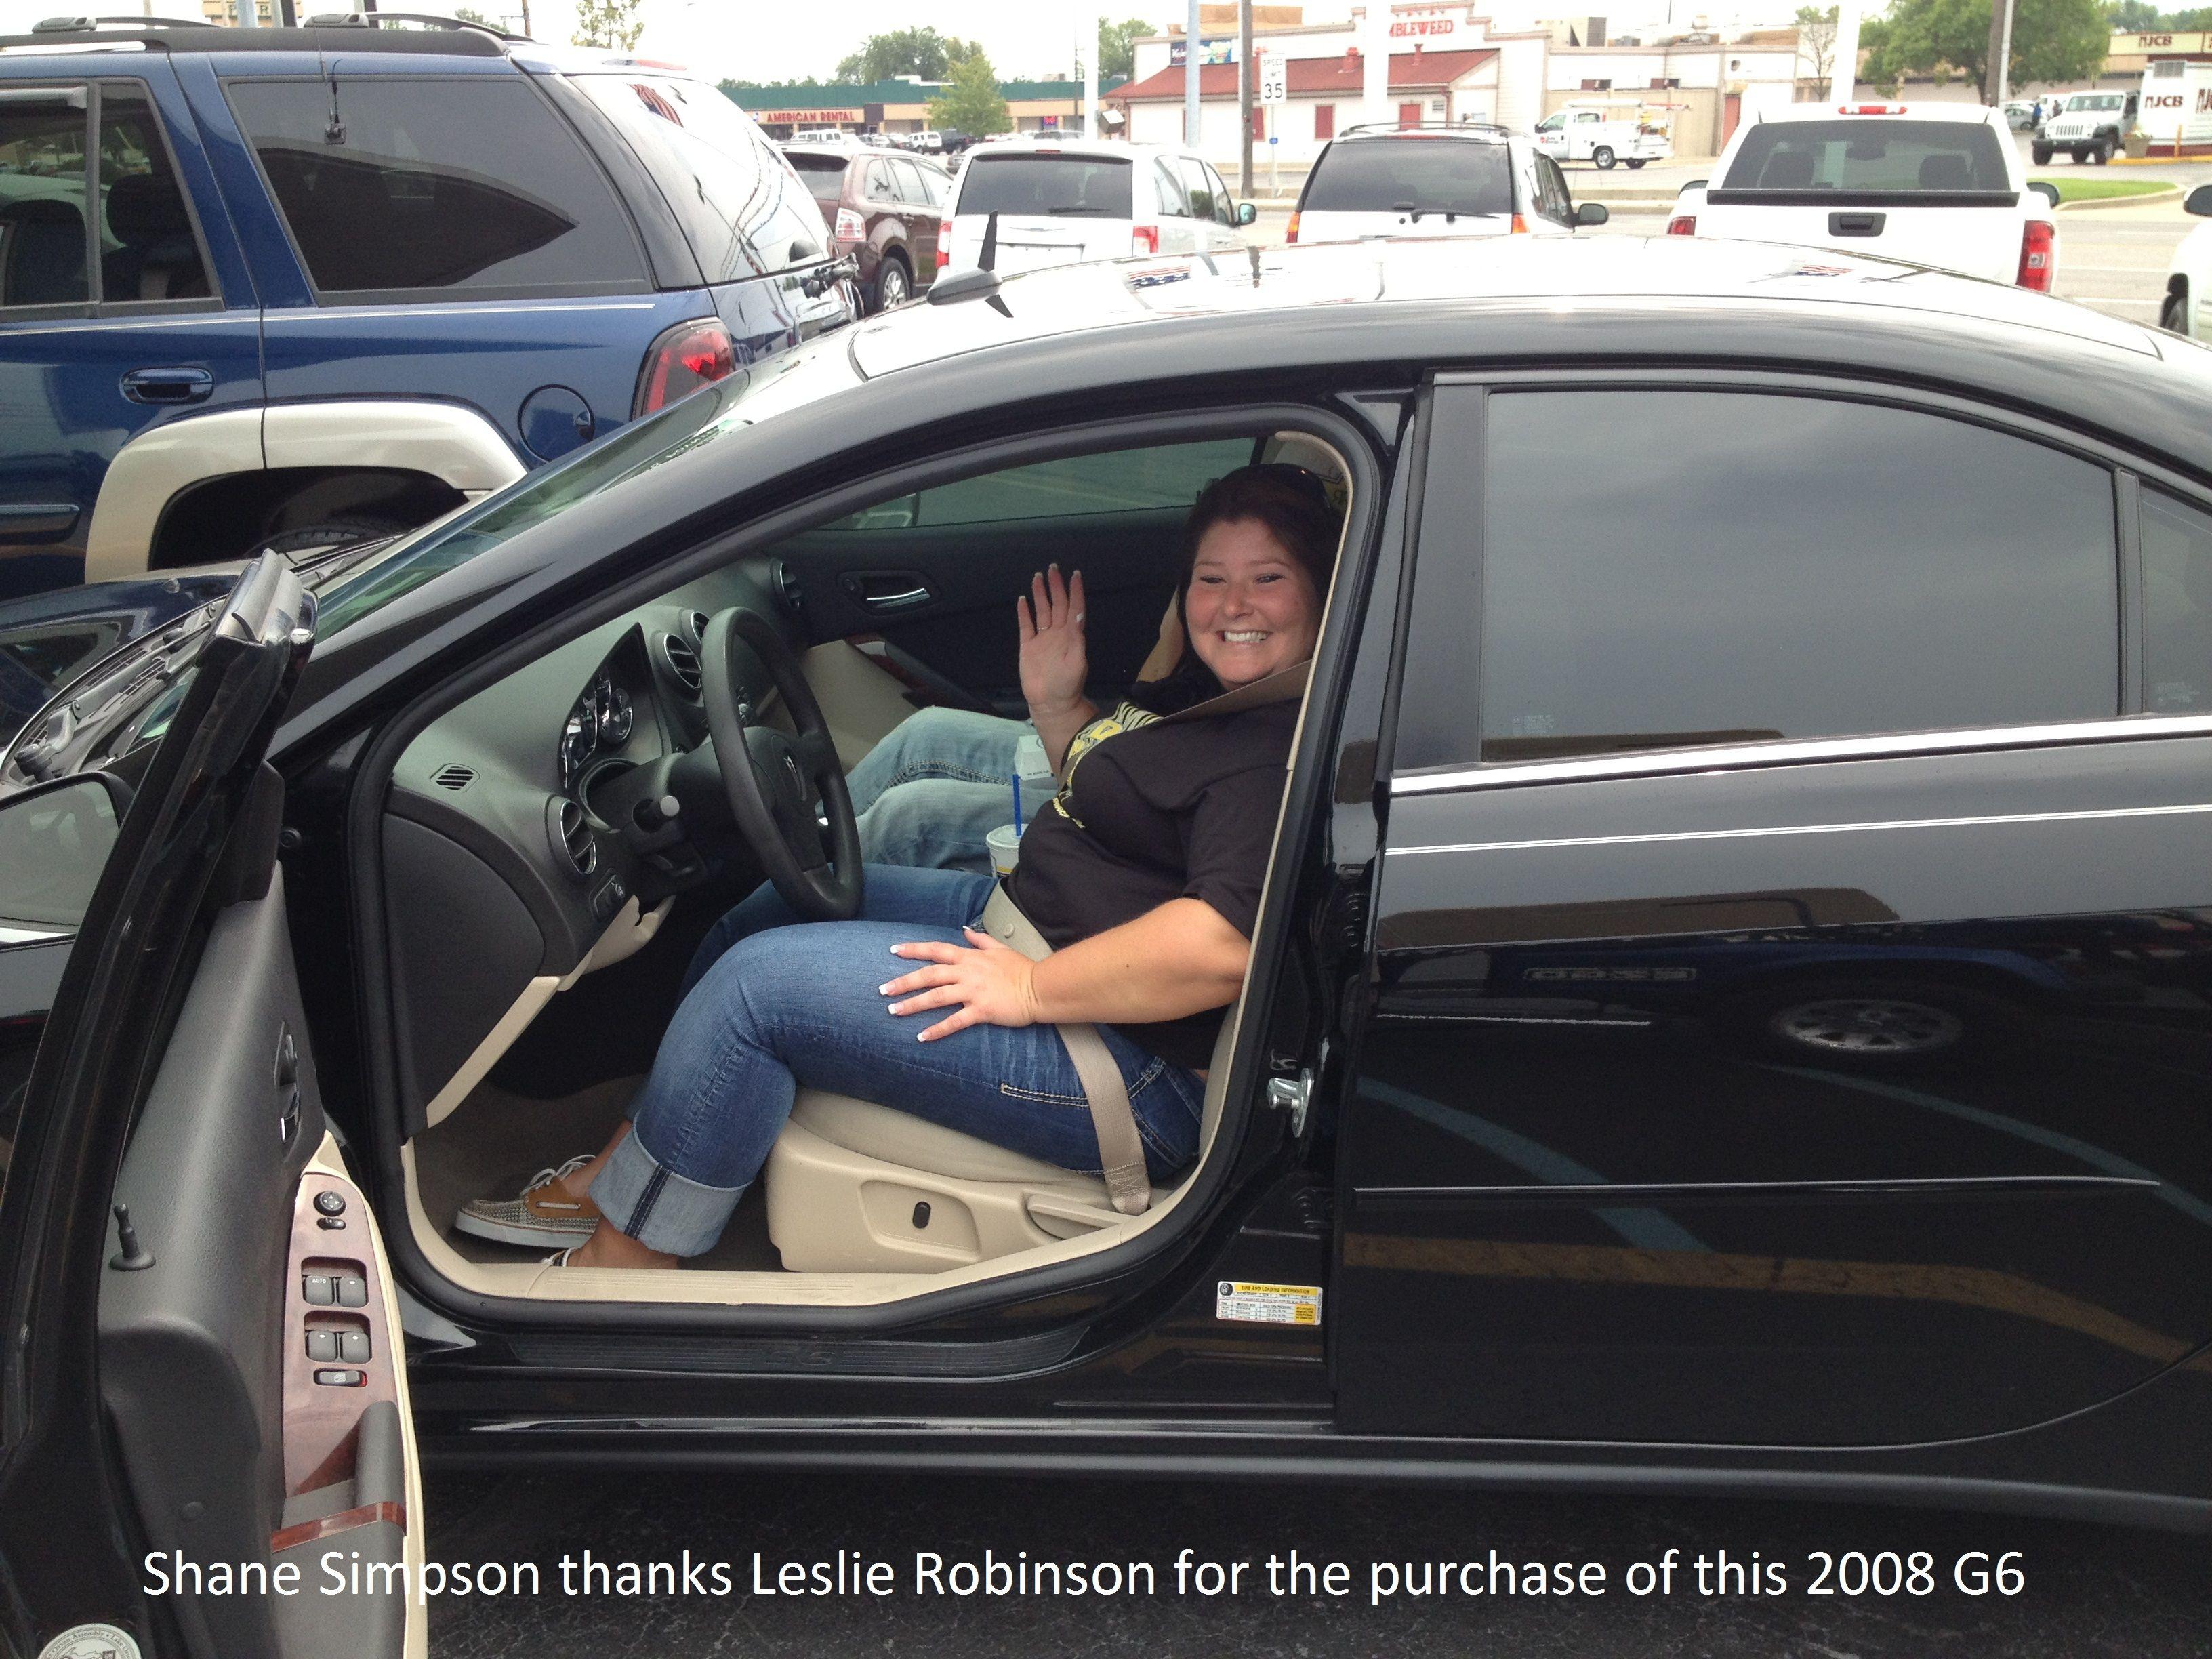 Bob Novick Chrysler Dodge >> Bob Novick Auto Mall Is A Chrysler Dodge Gmc Jeep Dealer .html | Autos Weblog